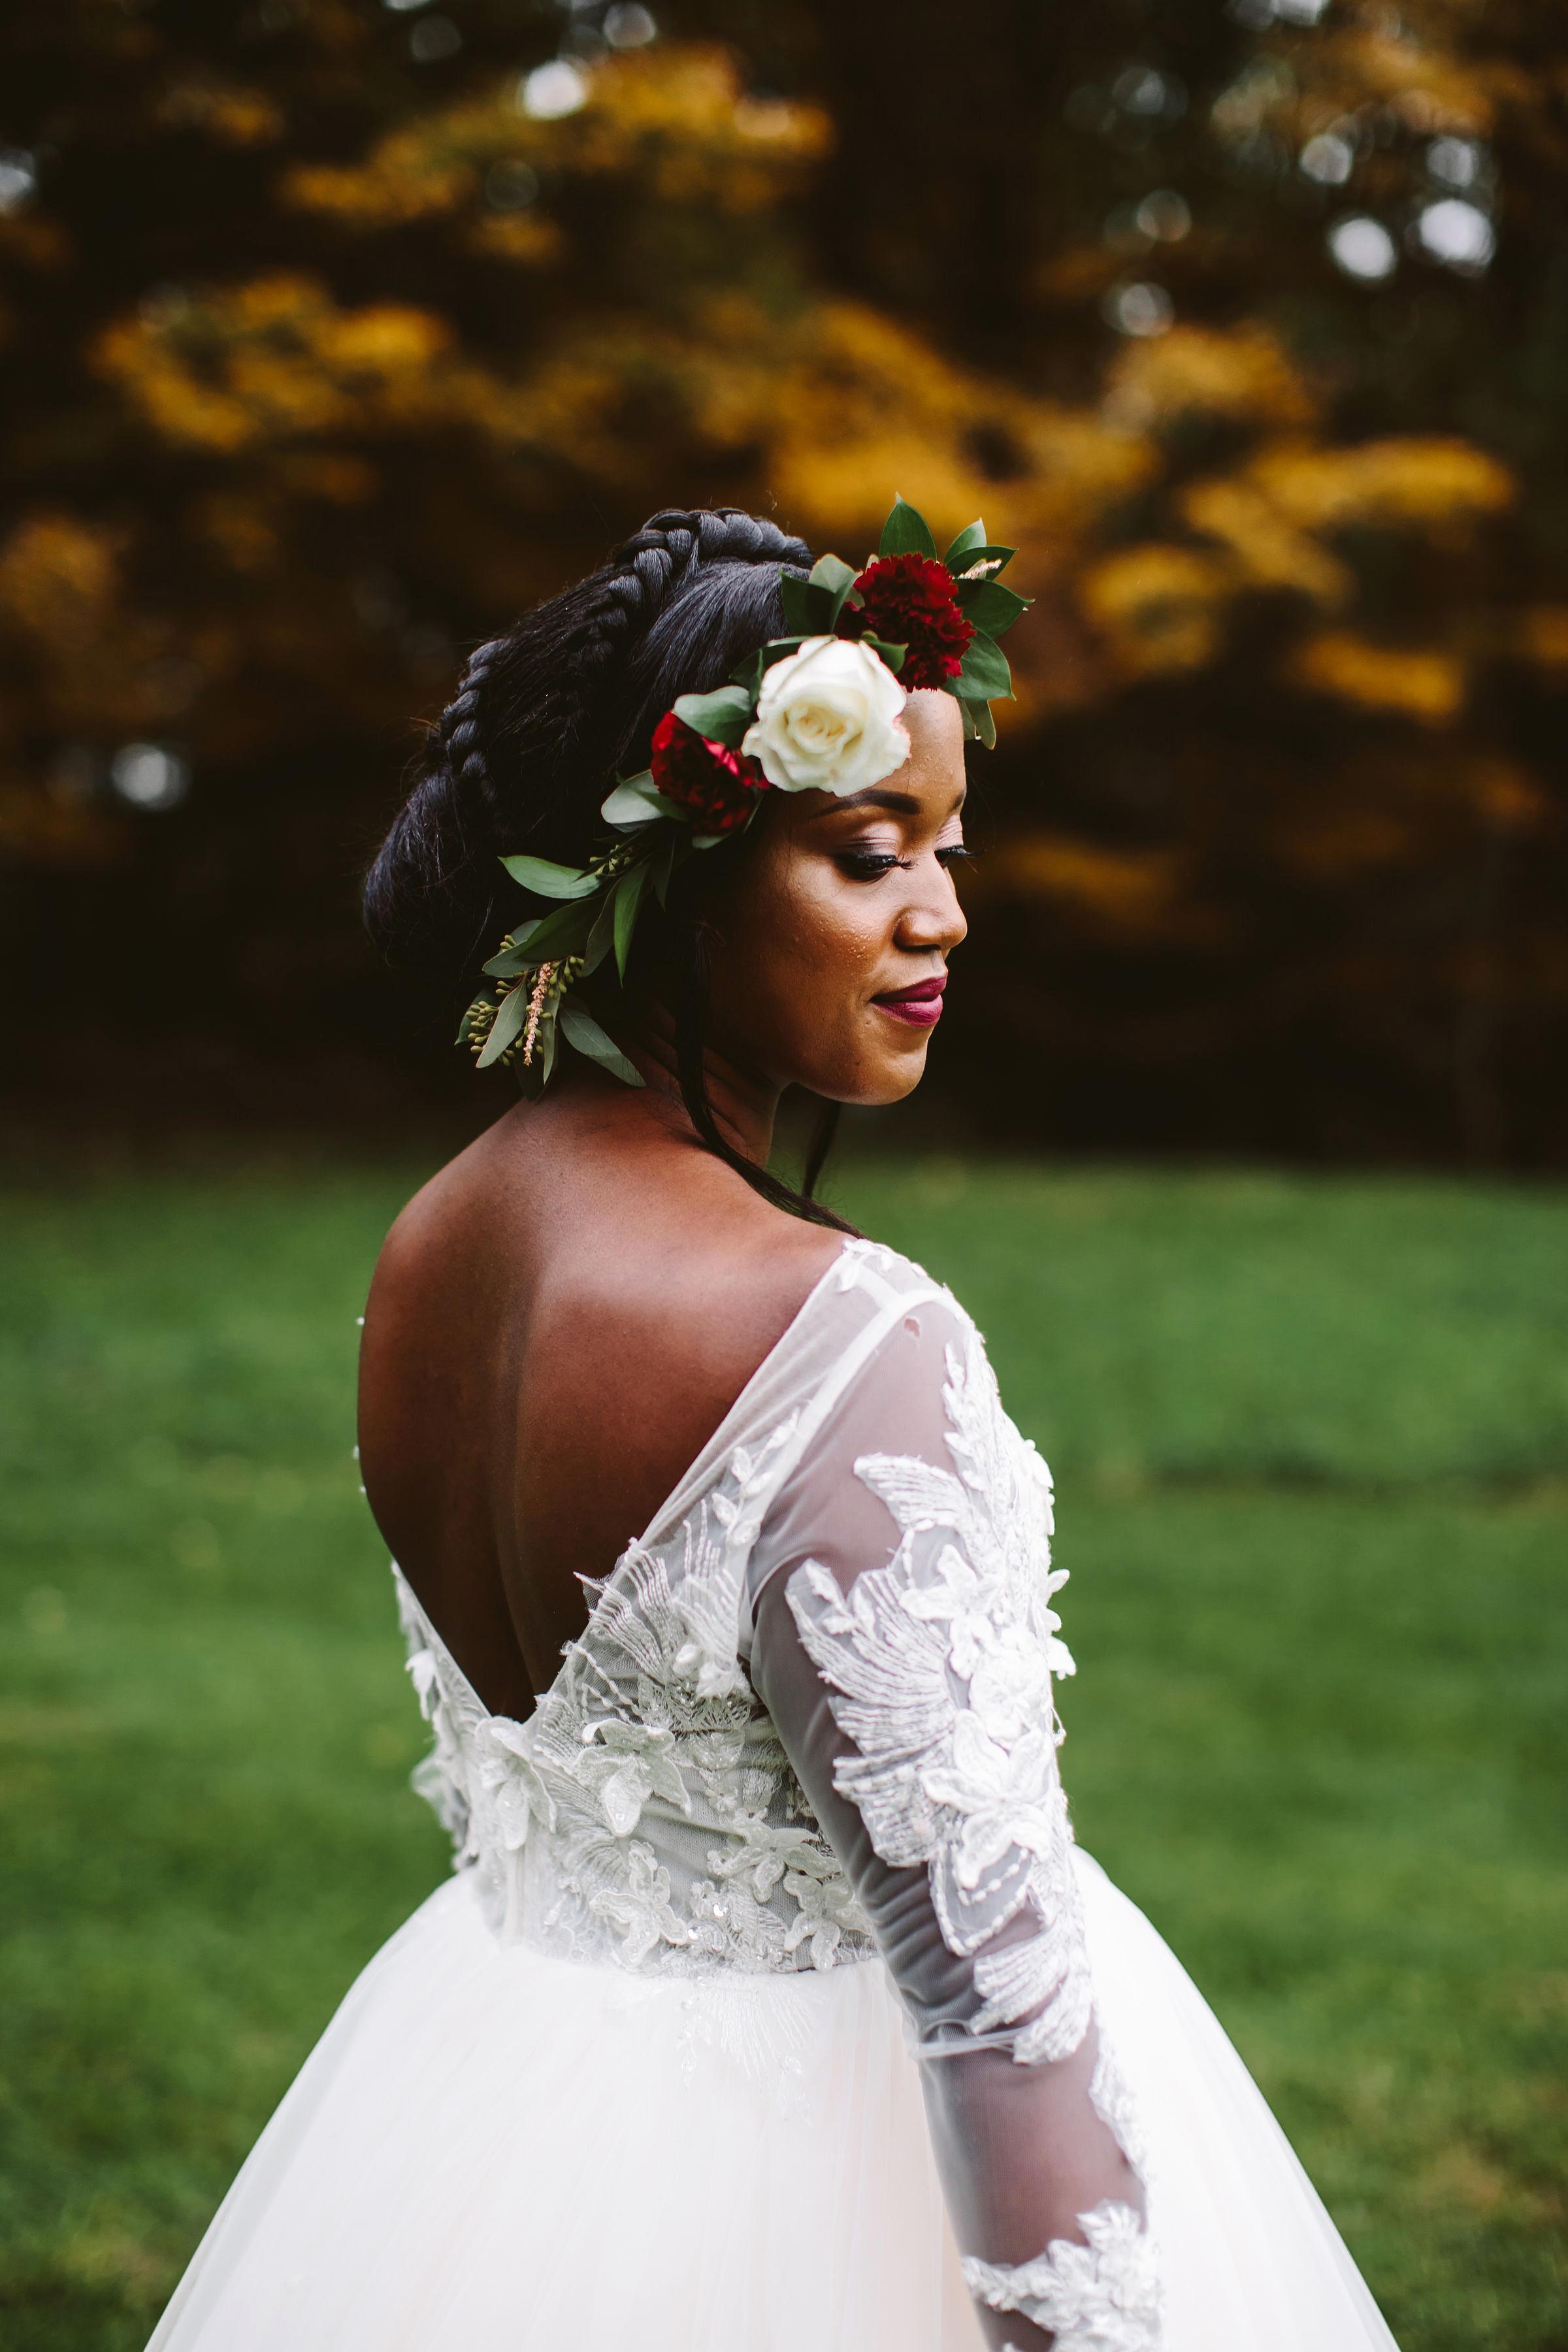 rivka aaron wedding bride low back dress flowers in hair